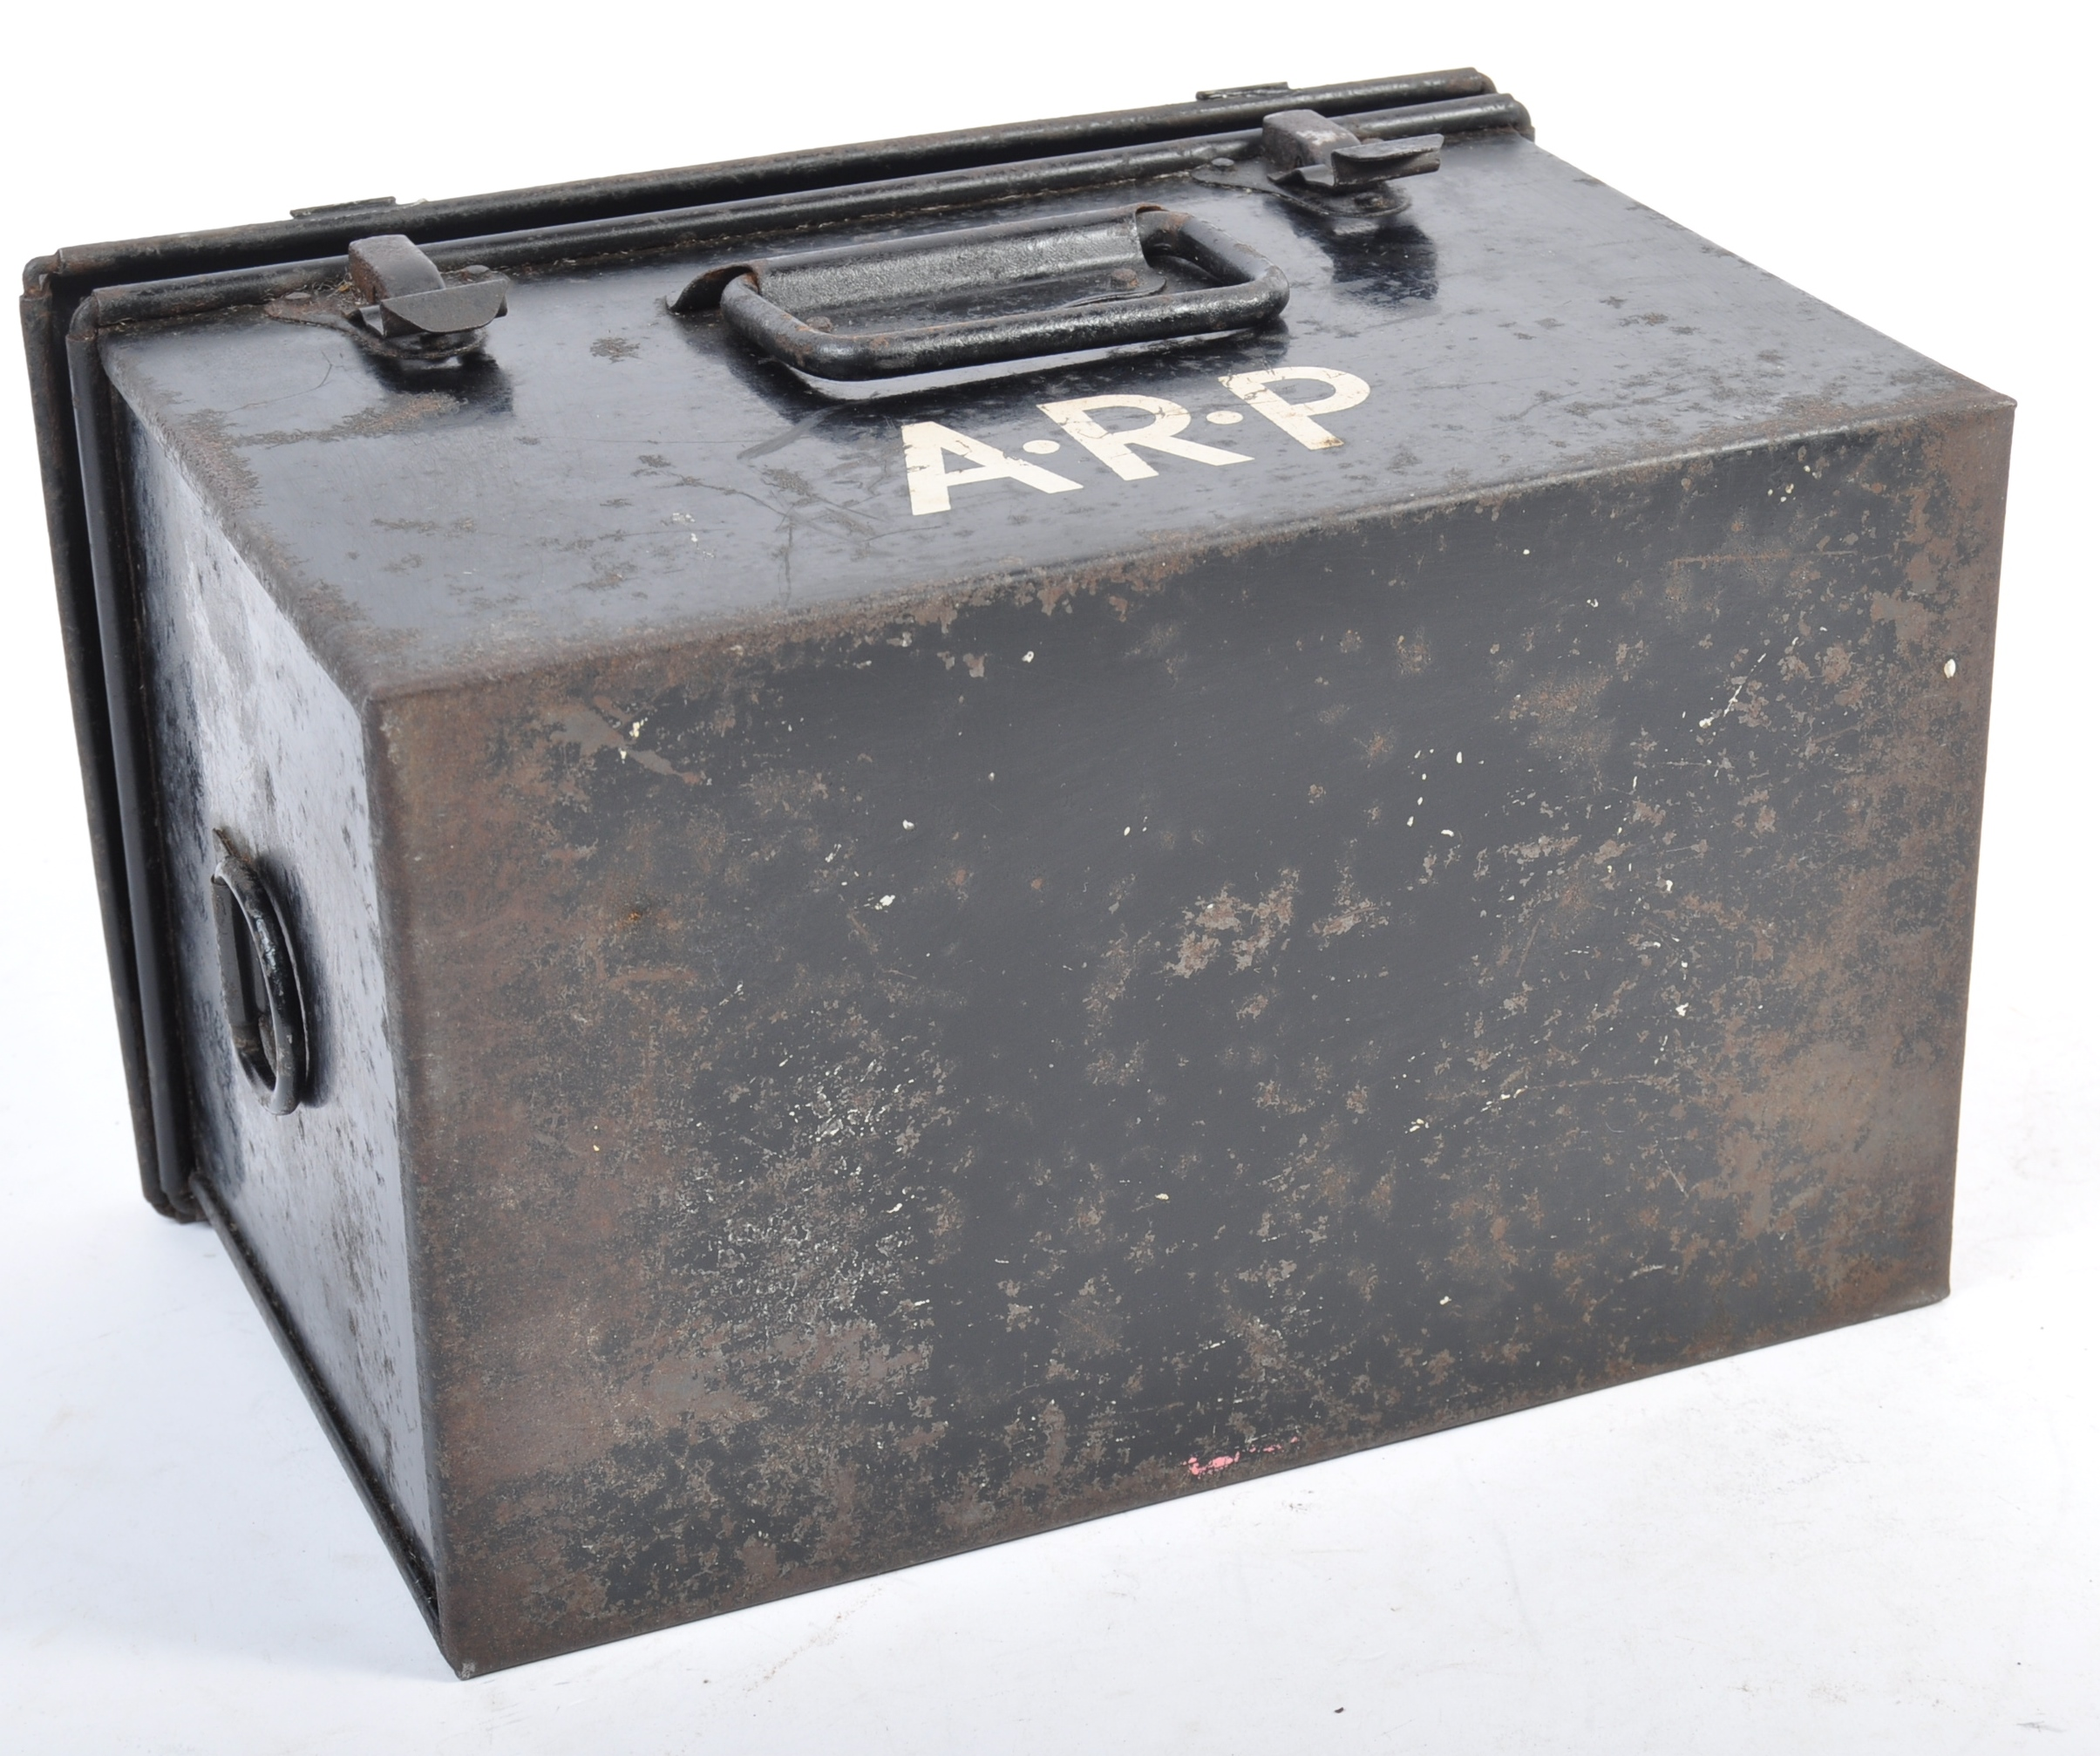 ORIGINAL WWII SECOND WORLD WAR AIR RAID PRECAUTIONS FIRST AID TIN - Image 8 of 8